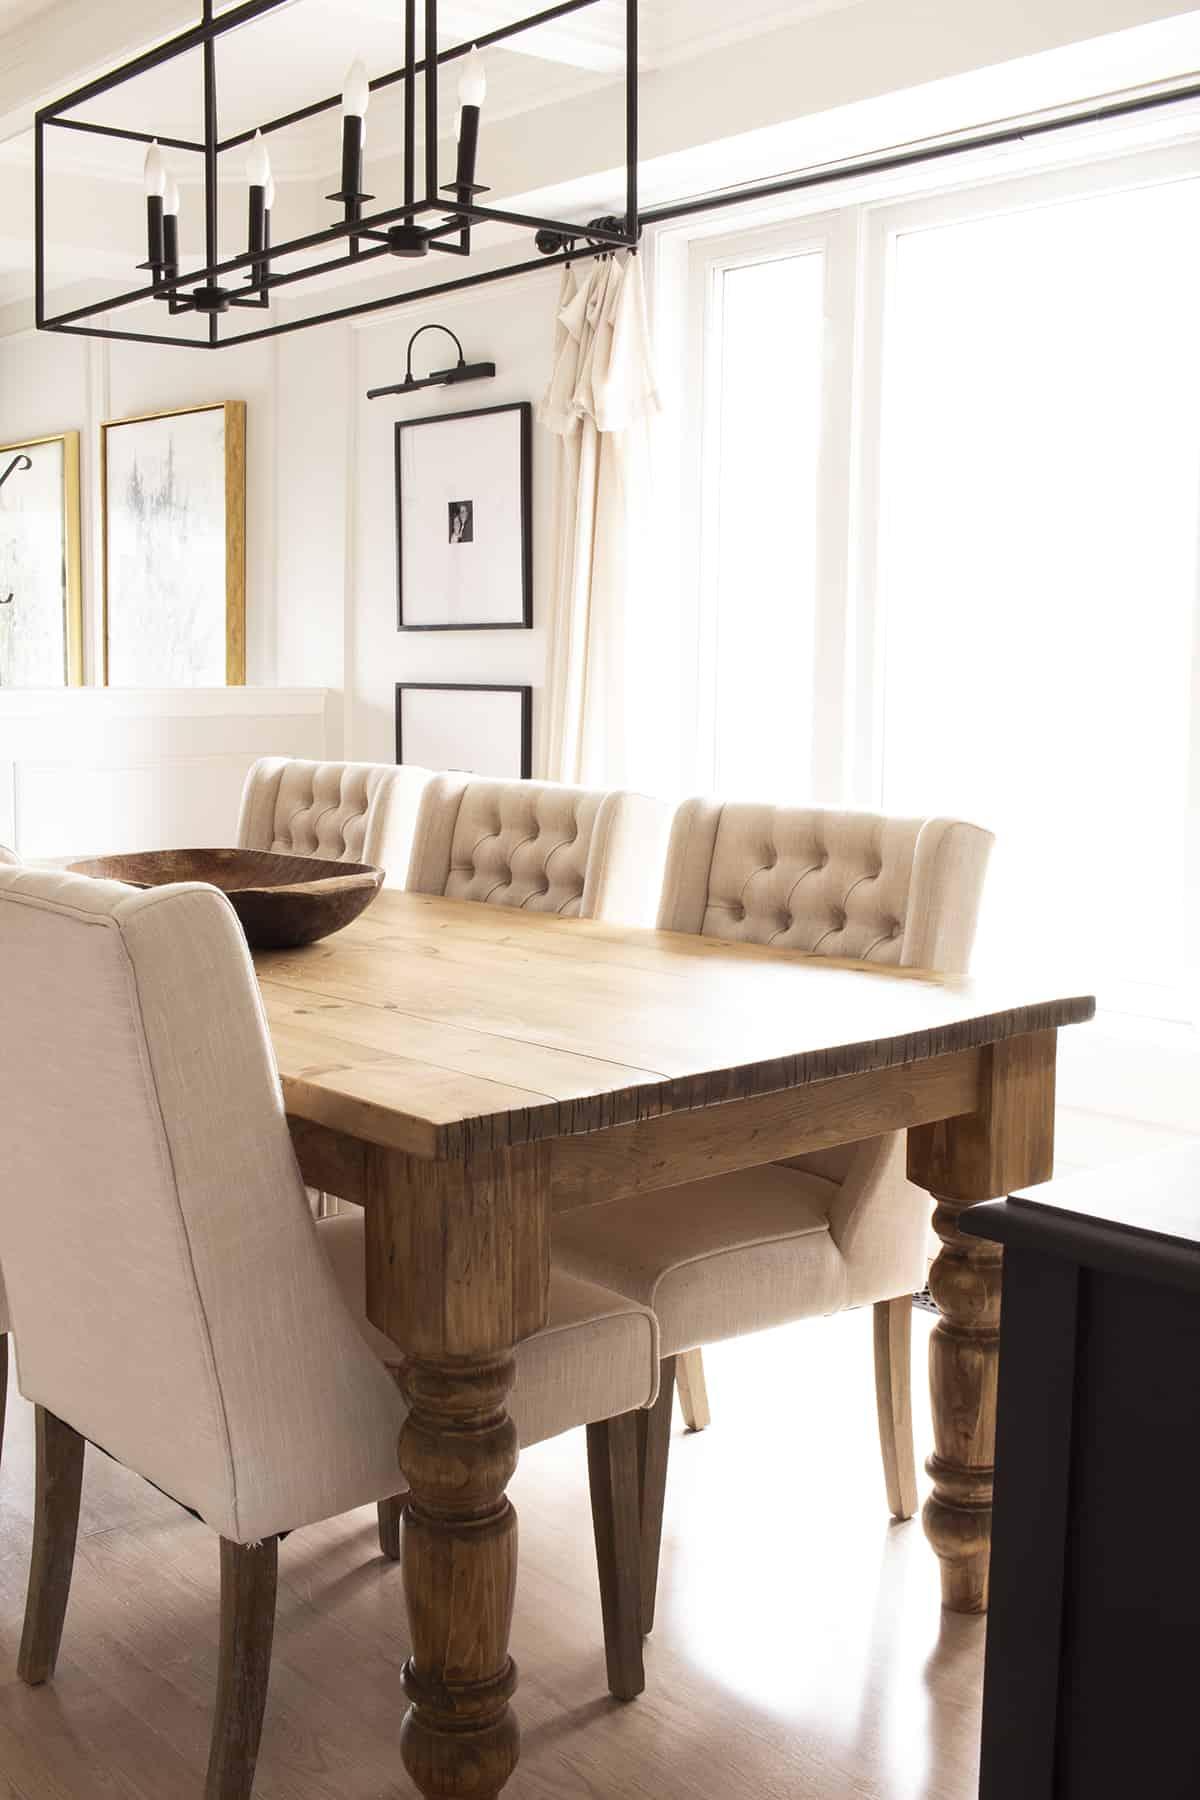 Rustic Farmhouse Table in Modern Farmhouse Dining Room